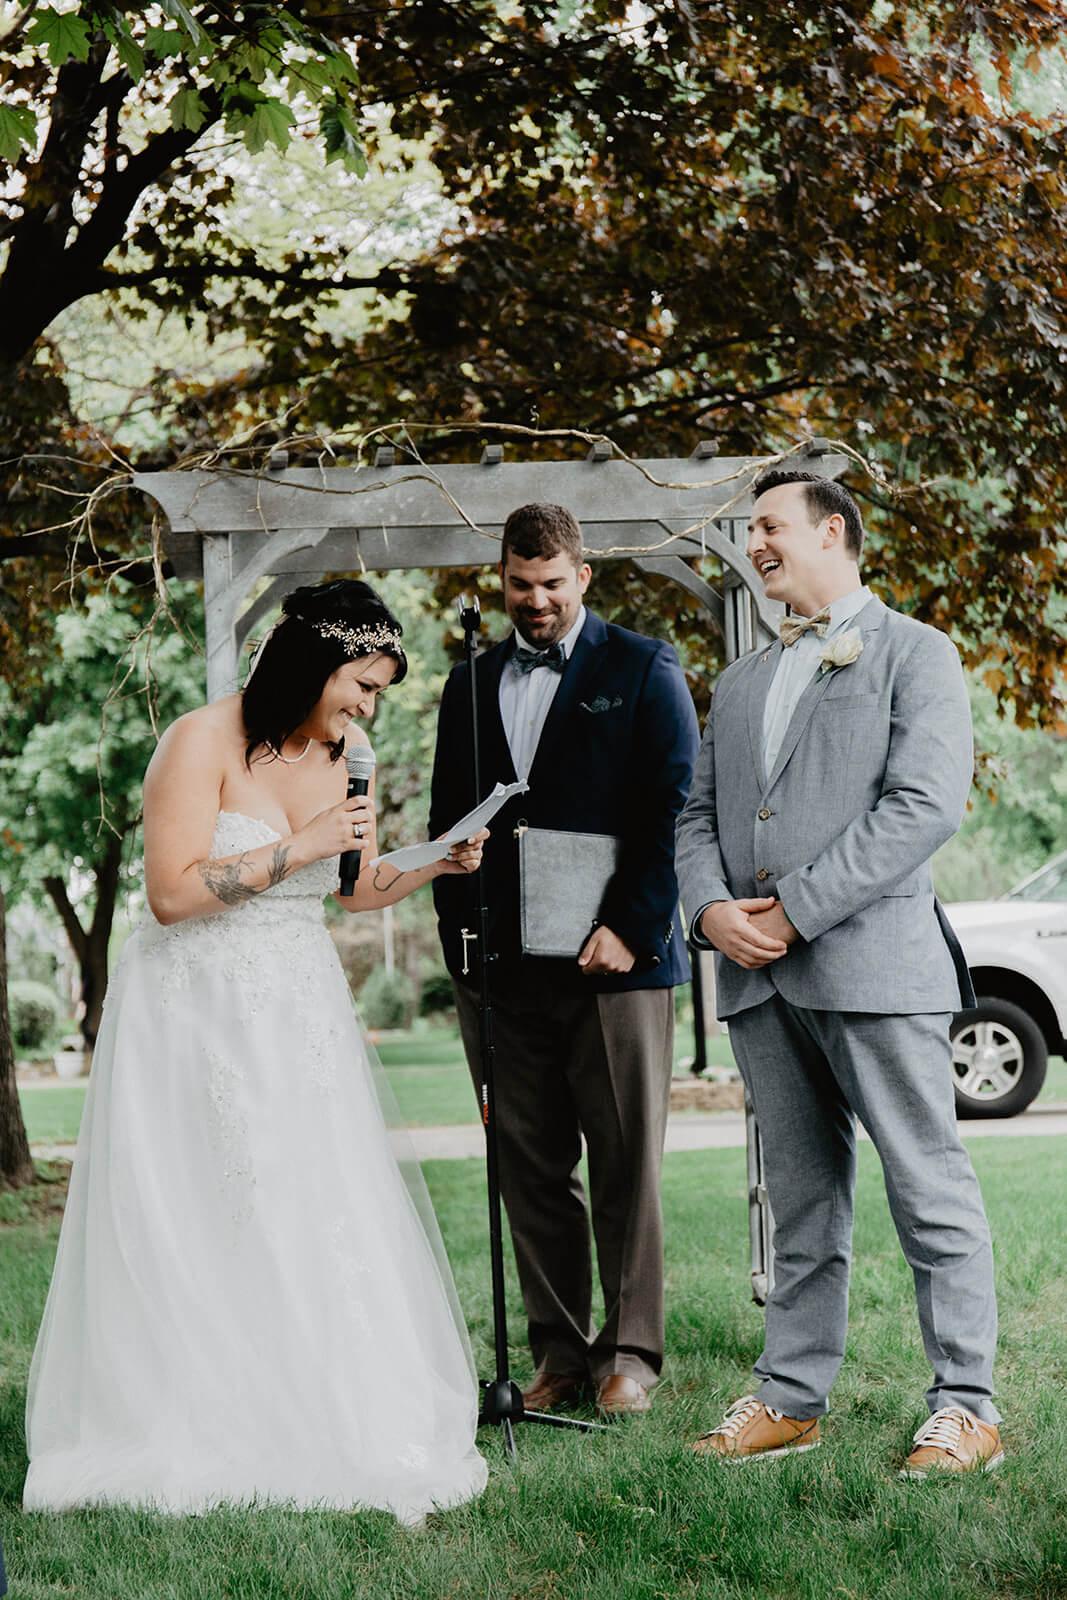 Alex + Lisi -- backyard Minnesota wedding -- Mads Lizotte photography -- Sixpence Events -- reading vows.jpg